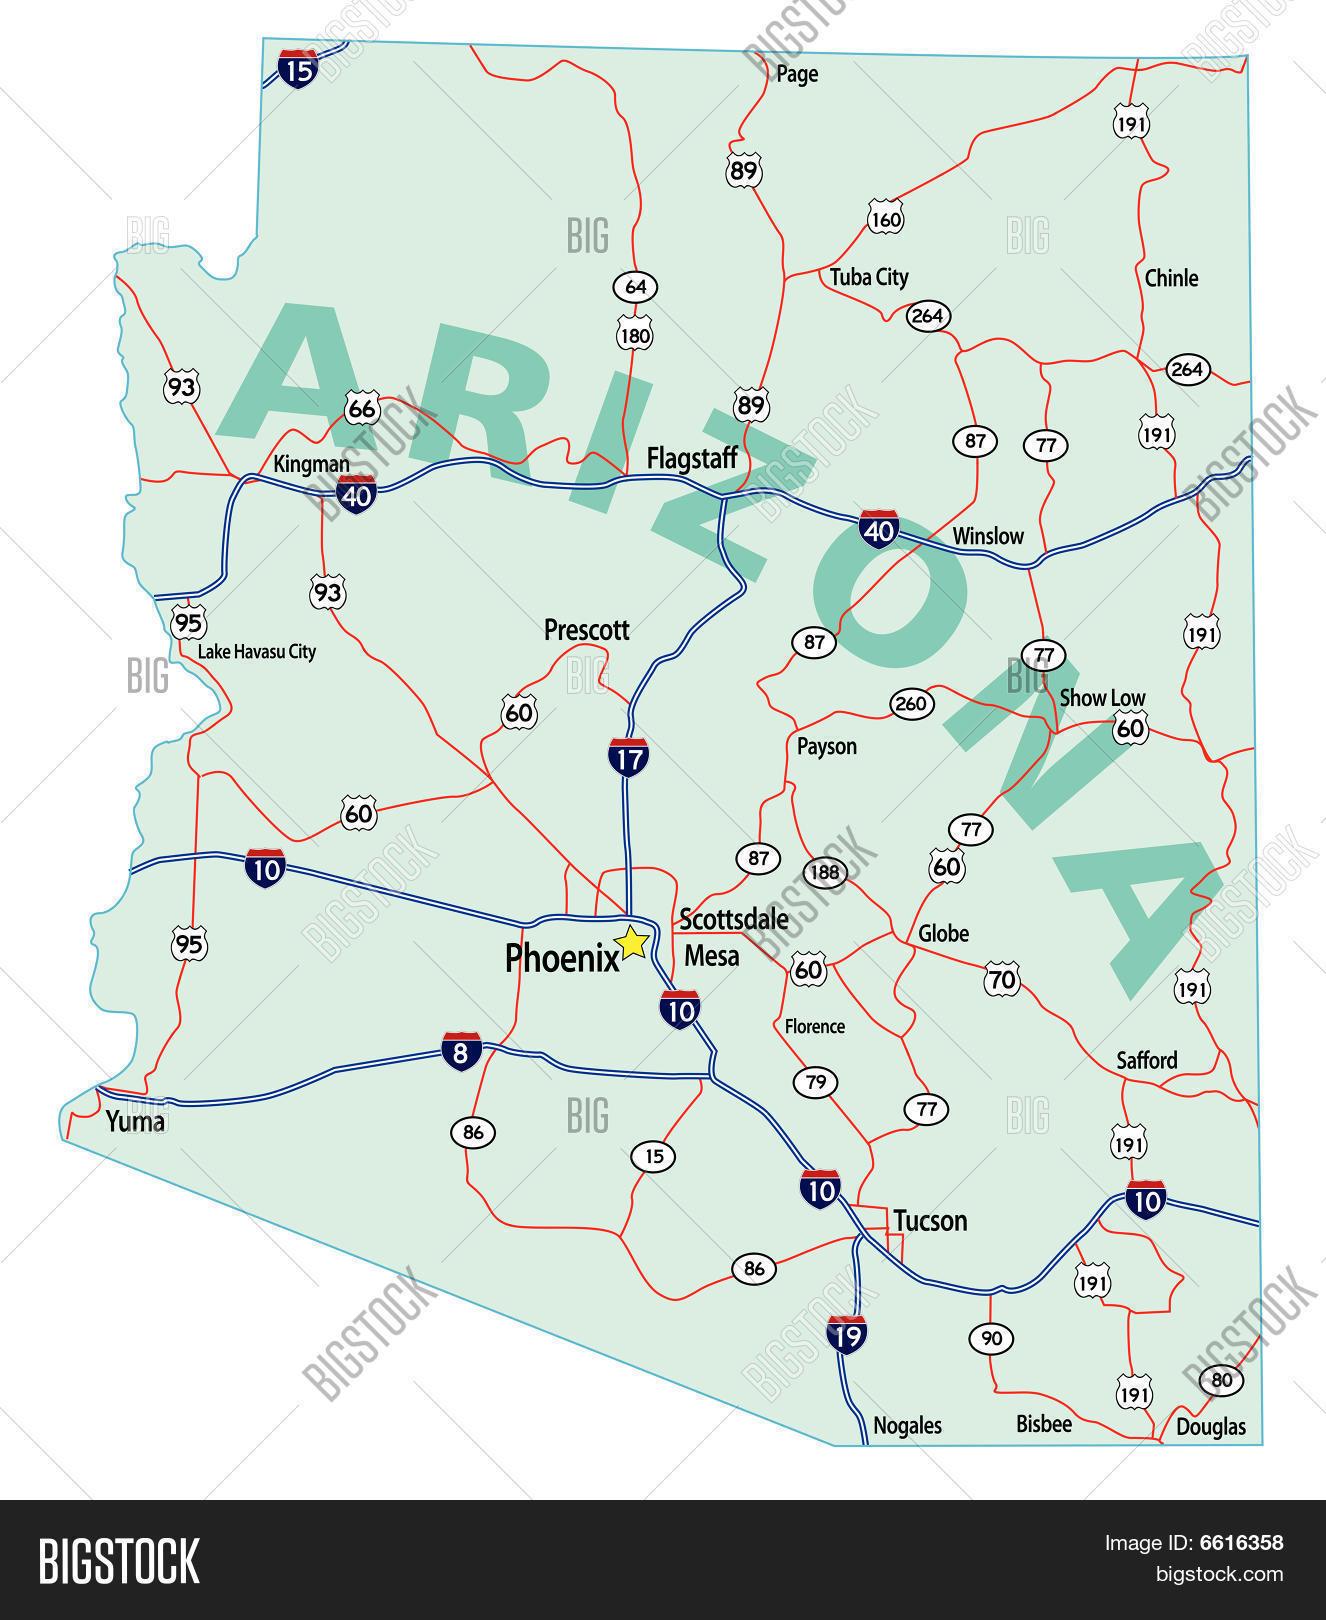 Arizona State Map Free.Arizona State Vector Photo Free Trial Bigstock